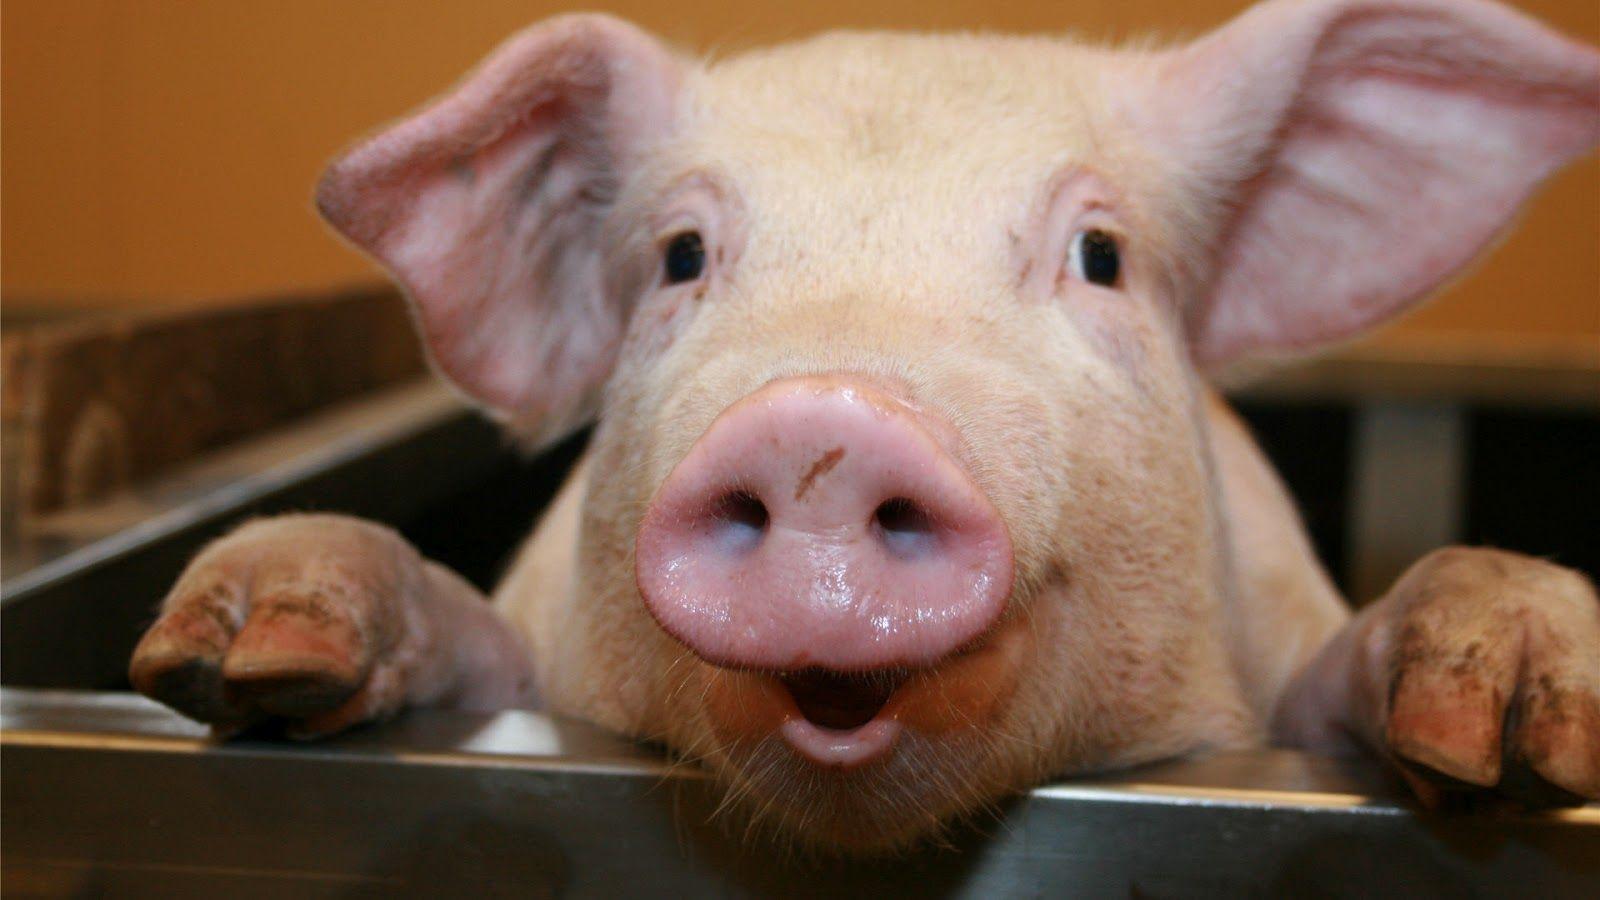 Científicos buscan 'cultivar' órganos humanos en cerdos